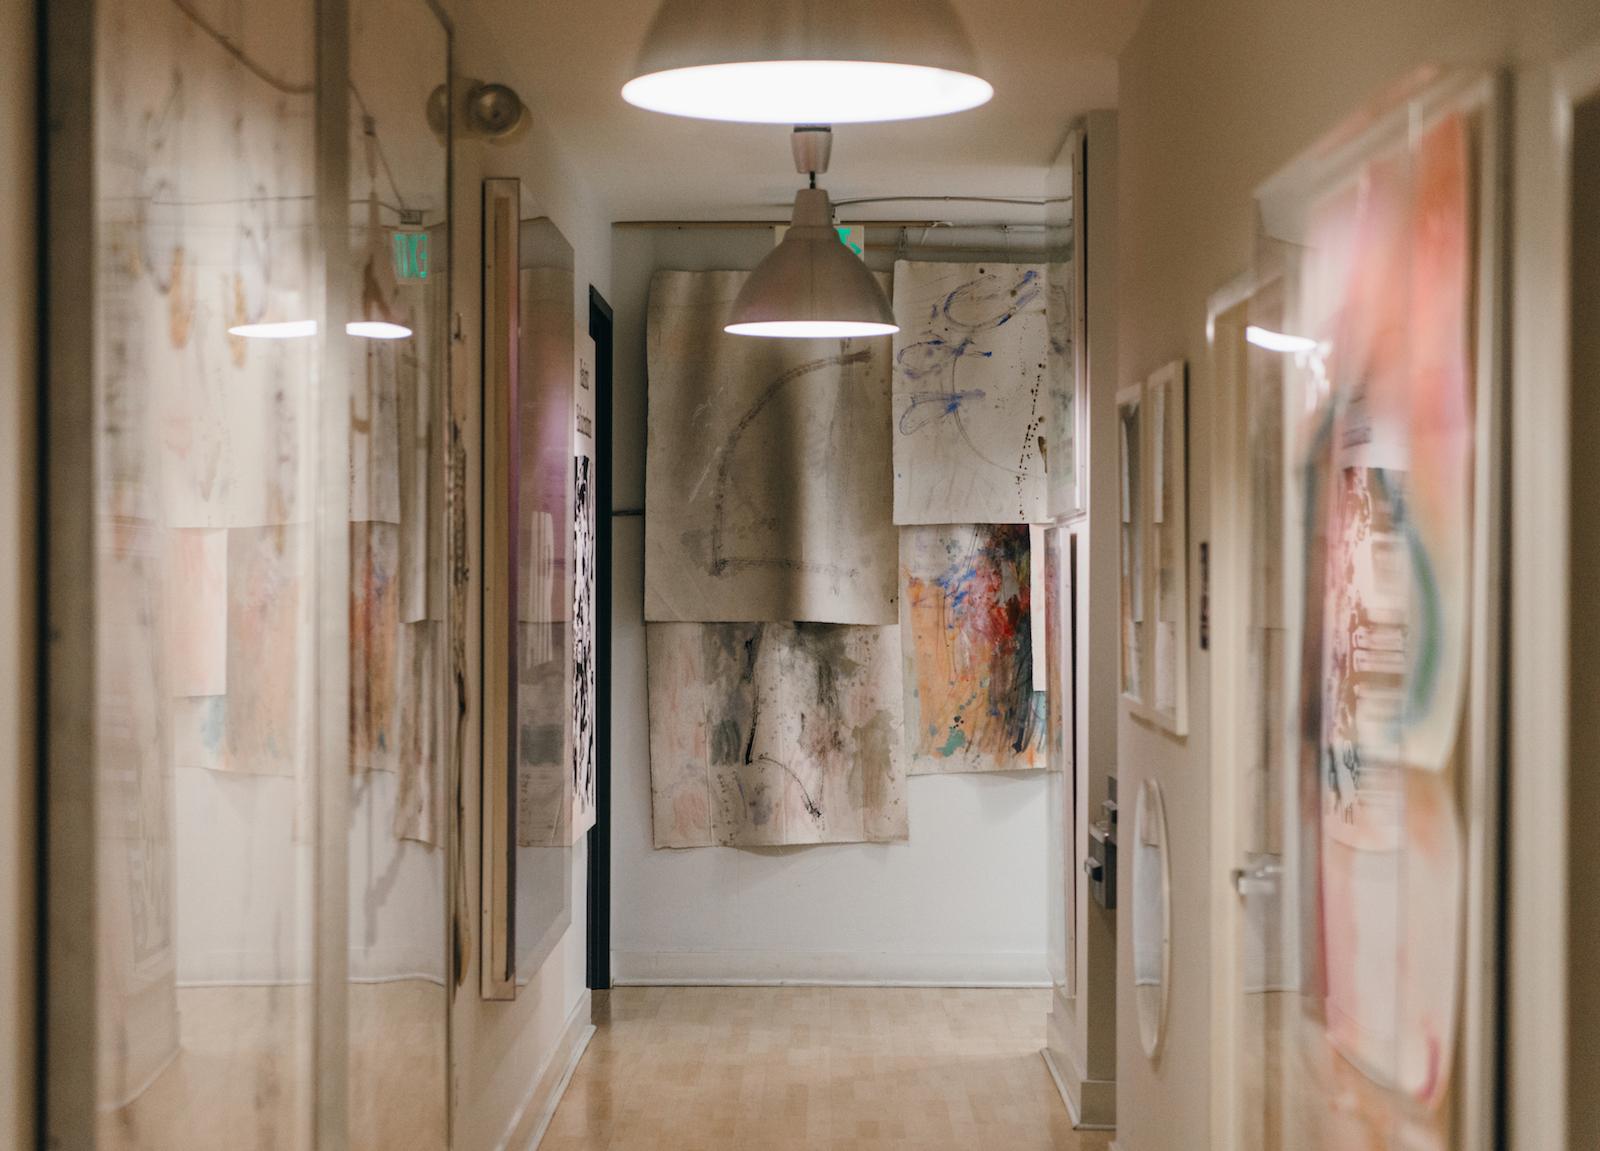 Hallway full of paintings